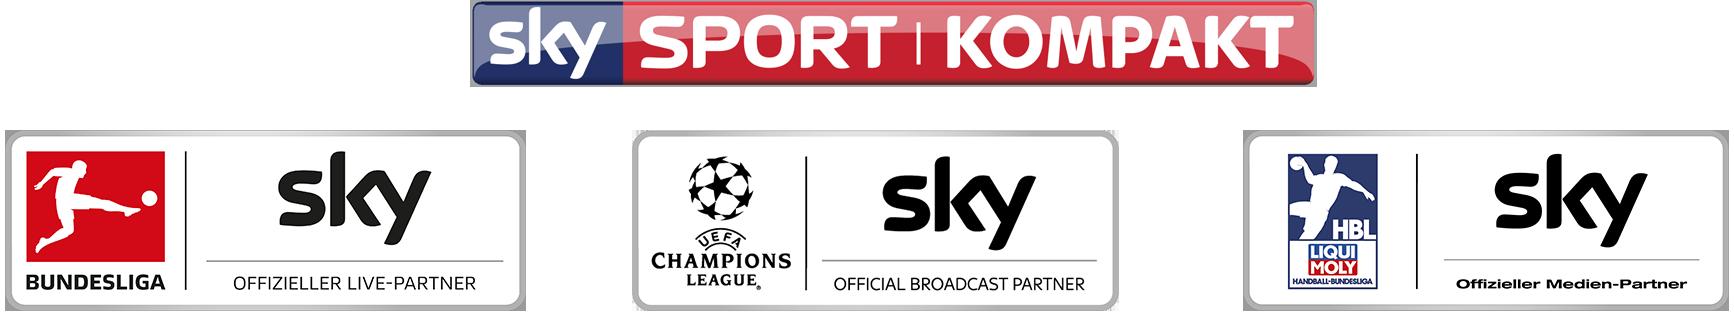 Sky Sport Kompakt